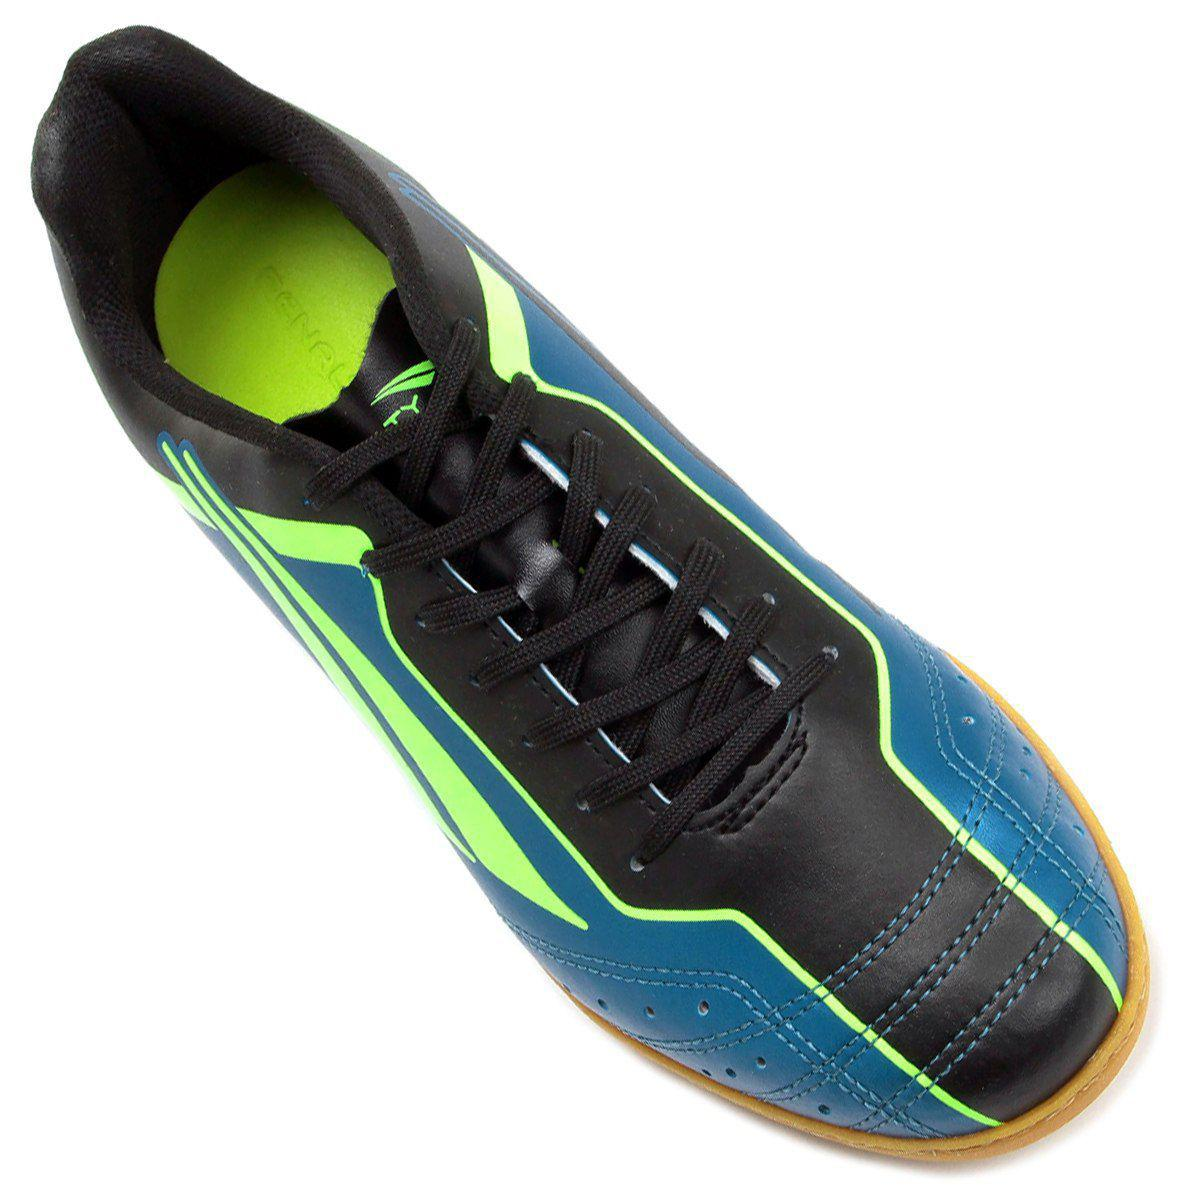 ae752ccb96 Chuteira Futsal Penalty Matis VI Masculino - Azul Verde - Chuteira ...